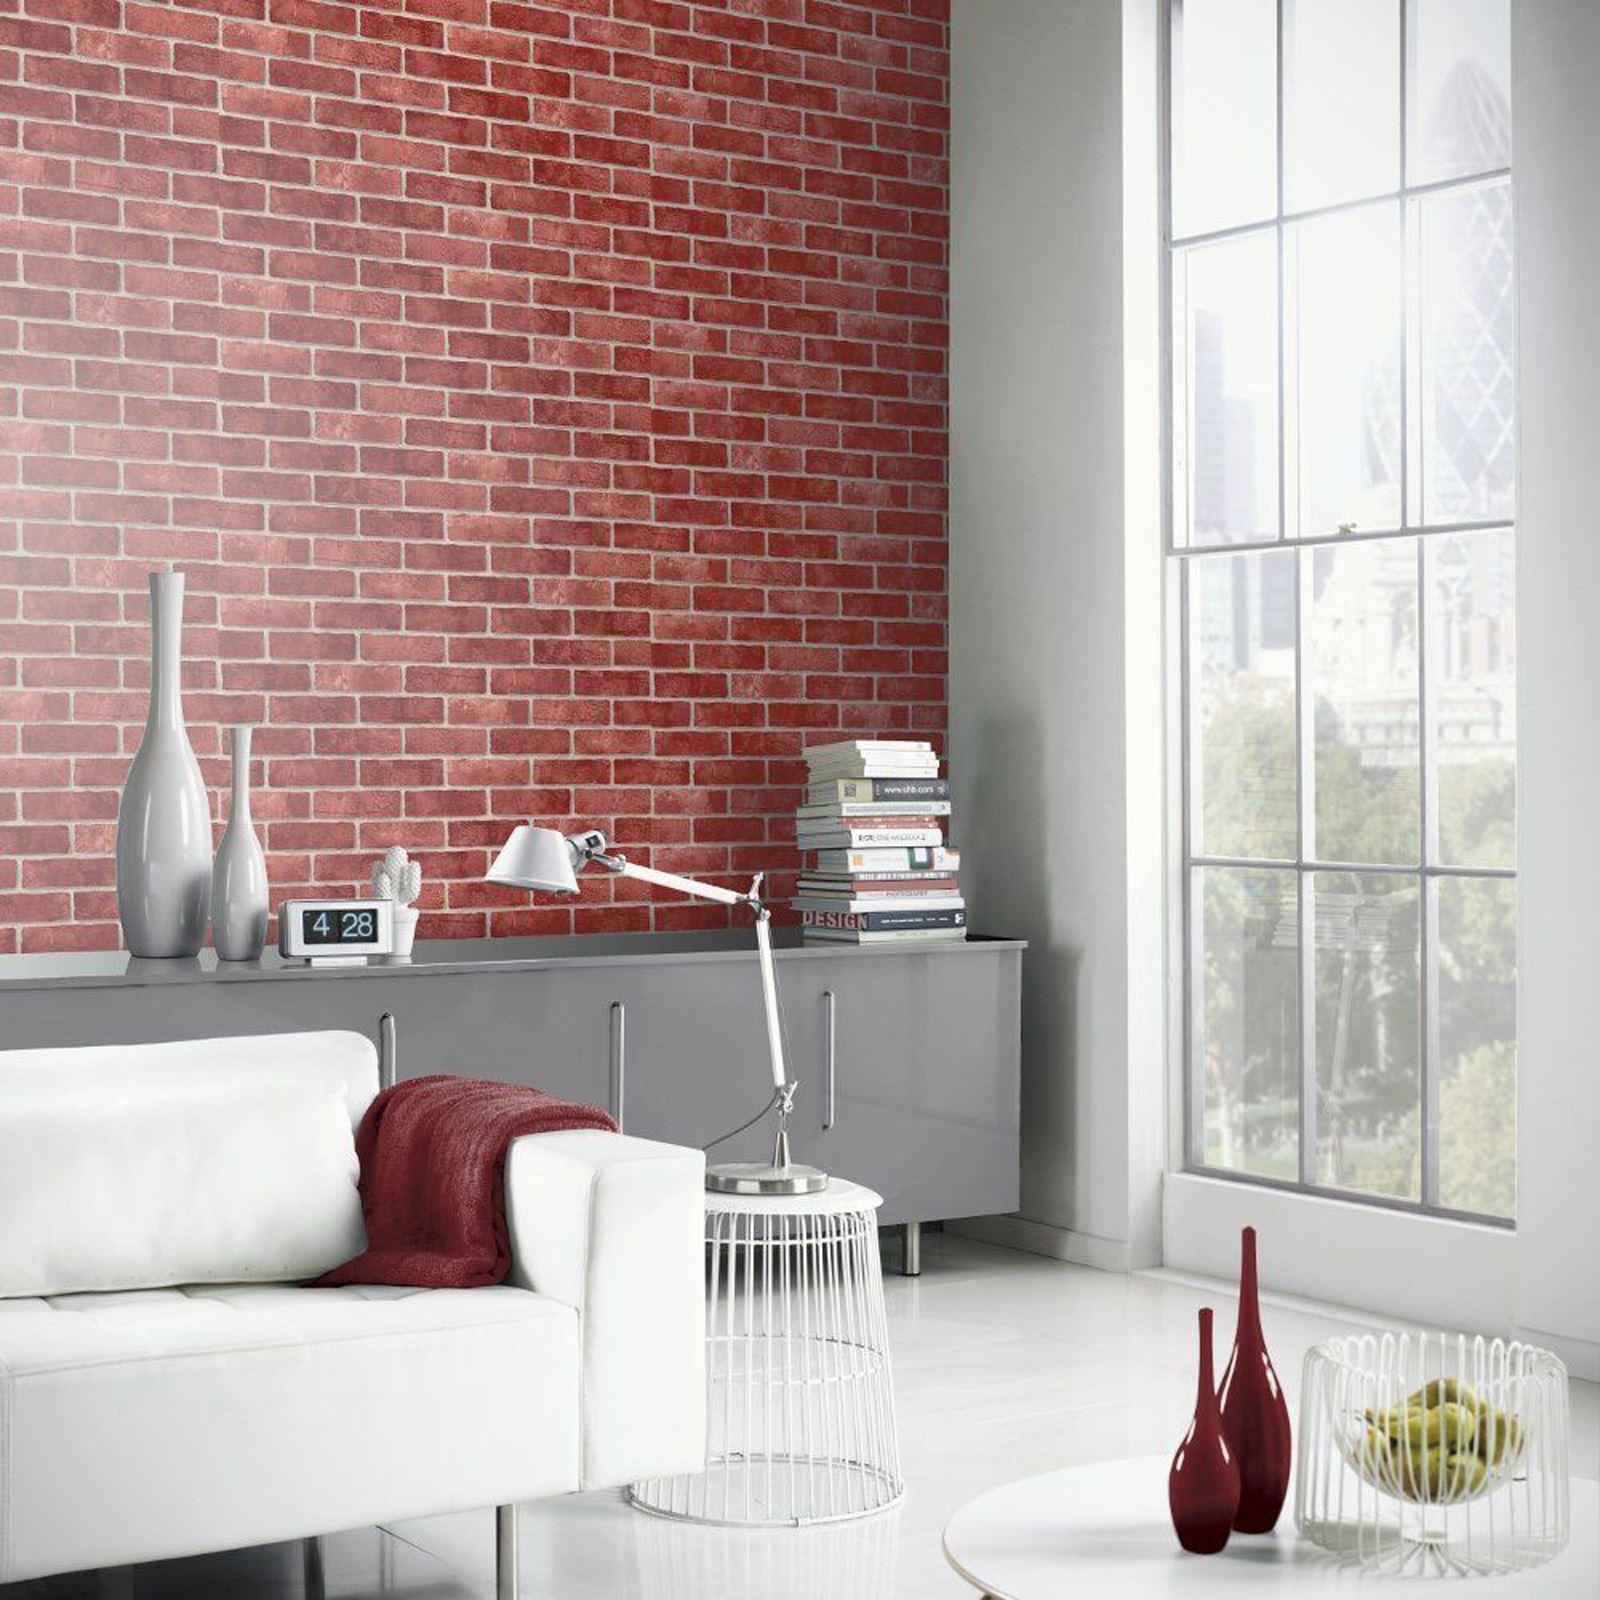 Red Brick Effect Realistic Wallpaper Room Decor Feature Red Brick Wallpaper Room 1600x1600 Wallpaper Teahub Io